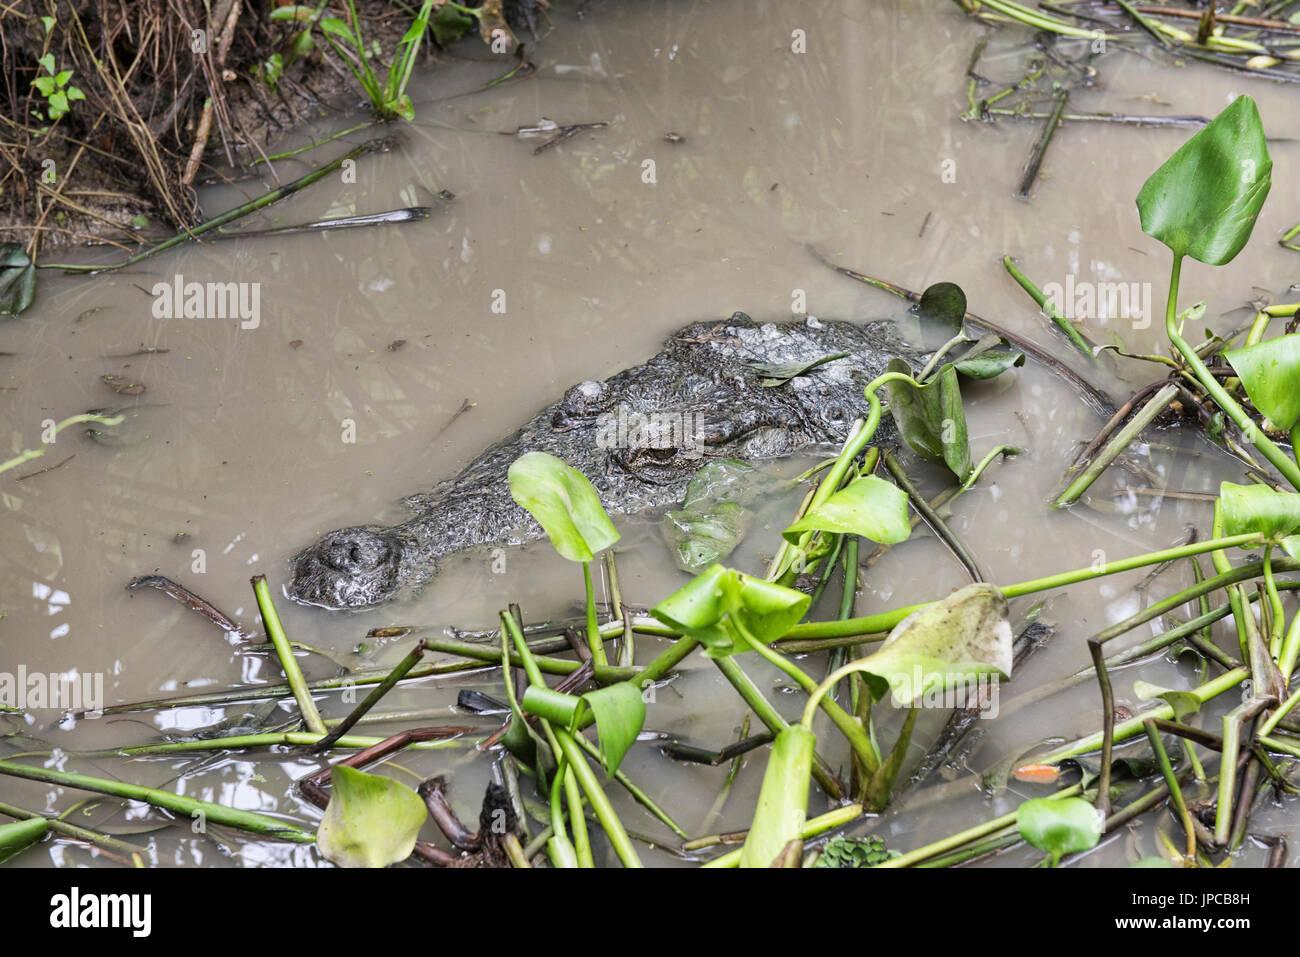 Lurking crocodile in the Thakur dighi pond, Bagerhat, Bangladesh - Stock Image